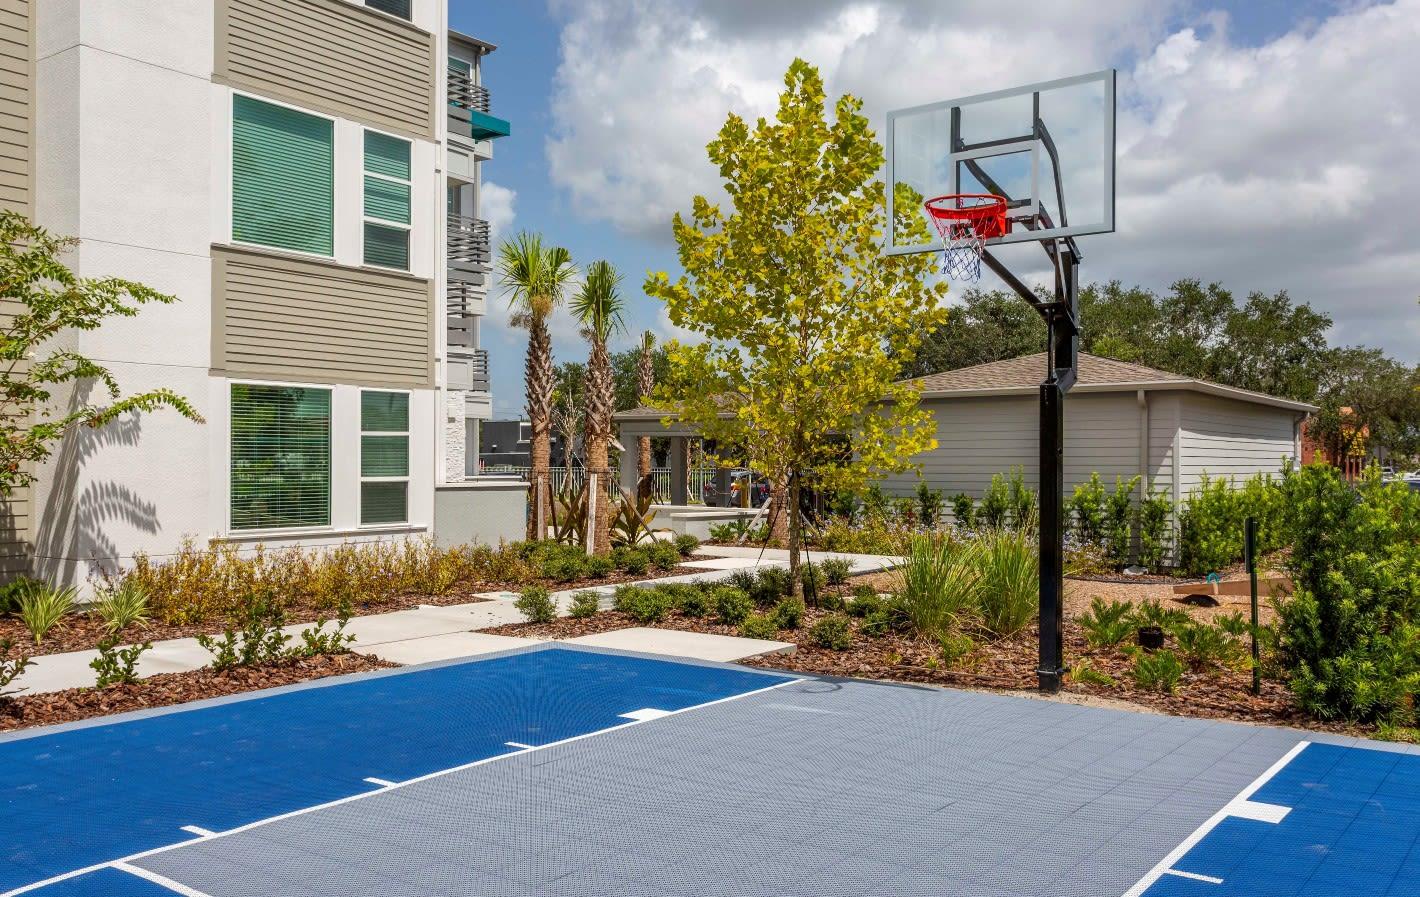 Basketball Court at 50 Paramount Apartments in Tampa Florida